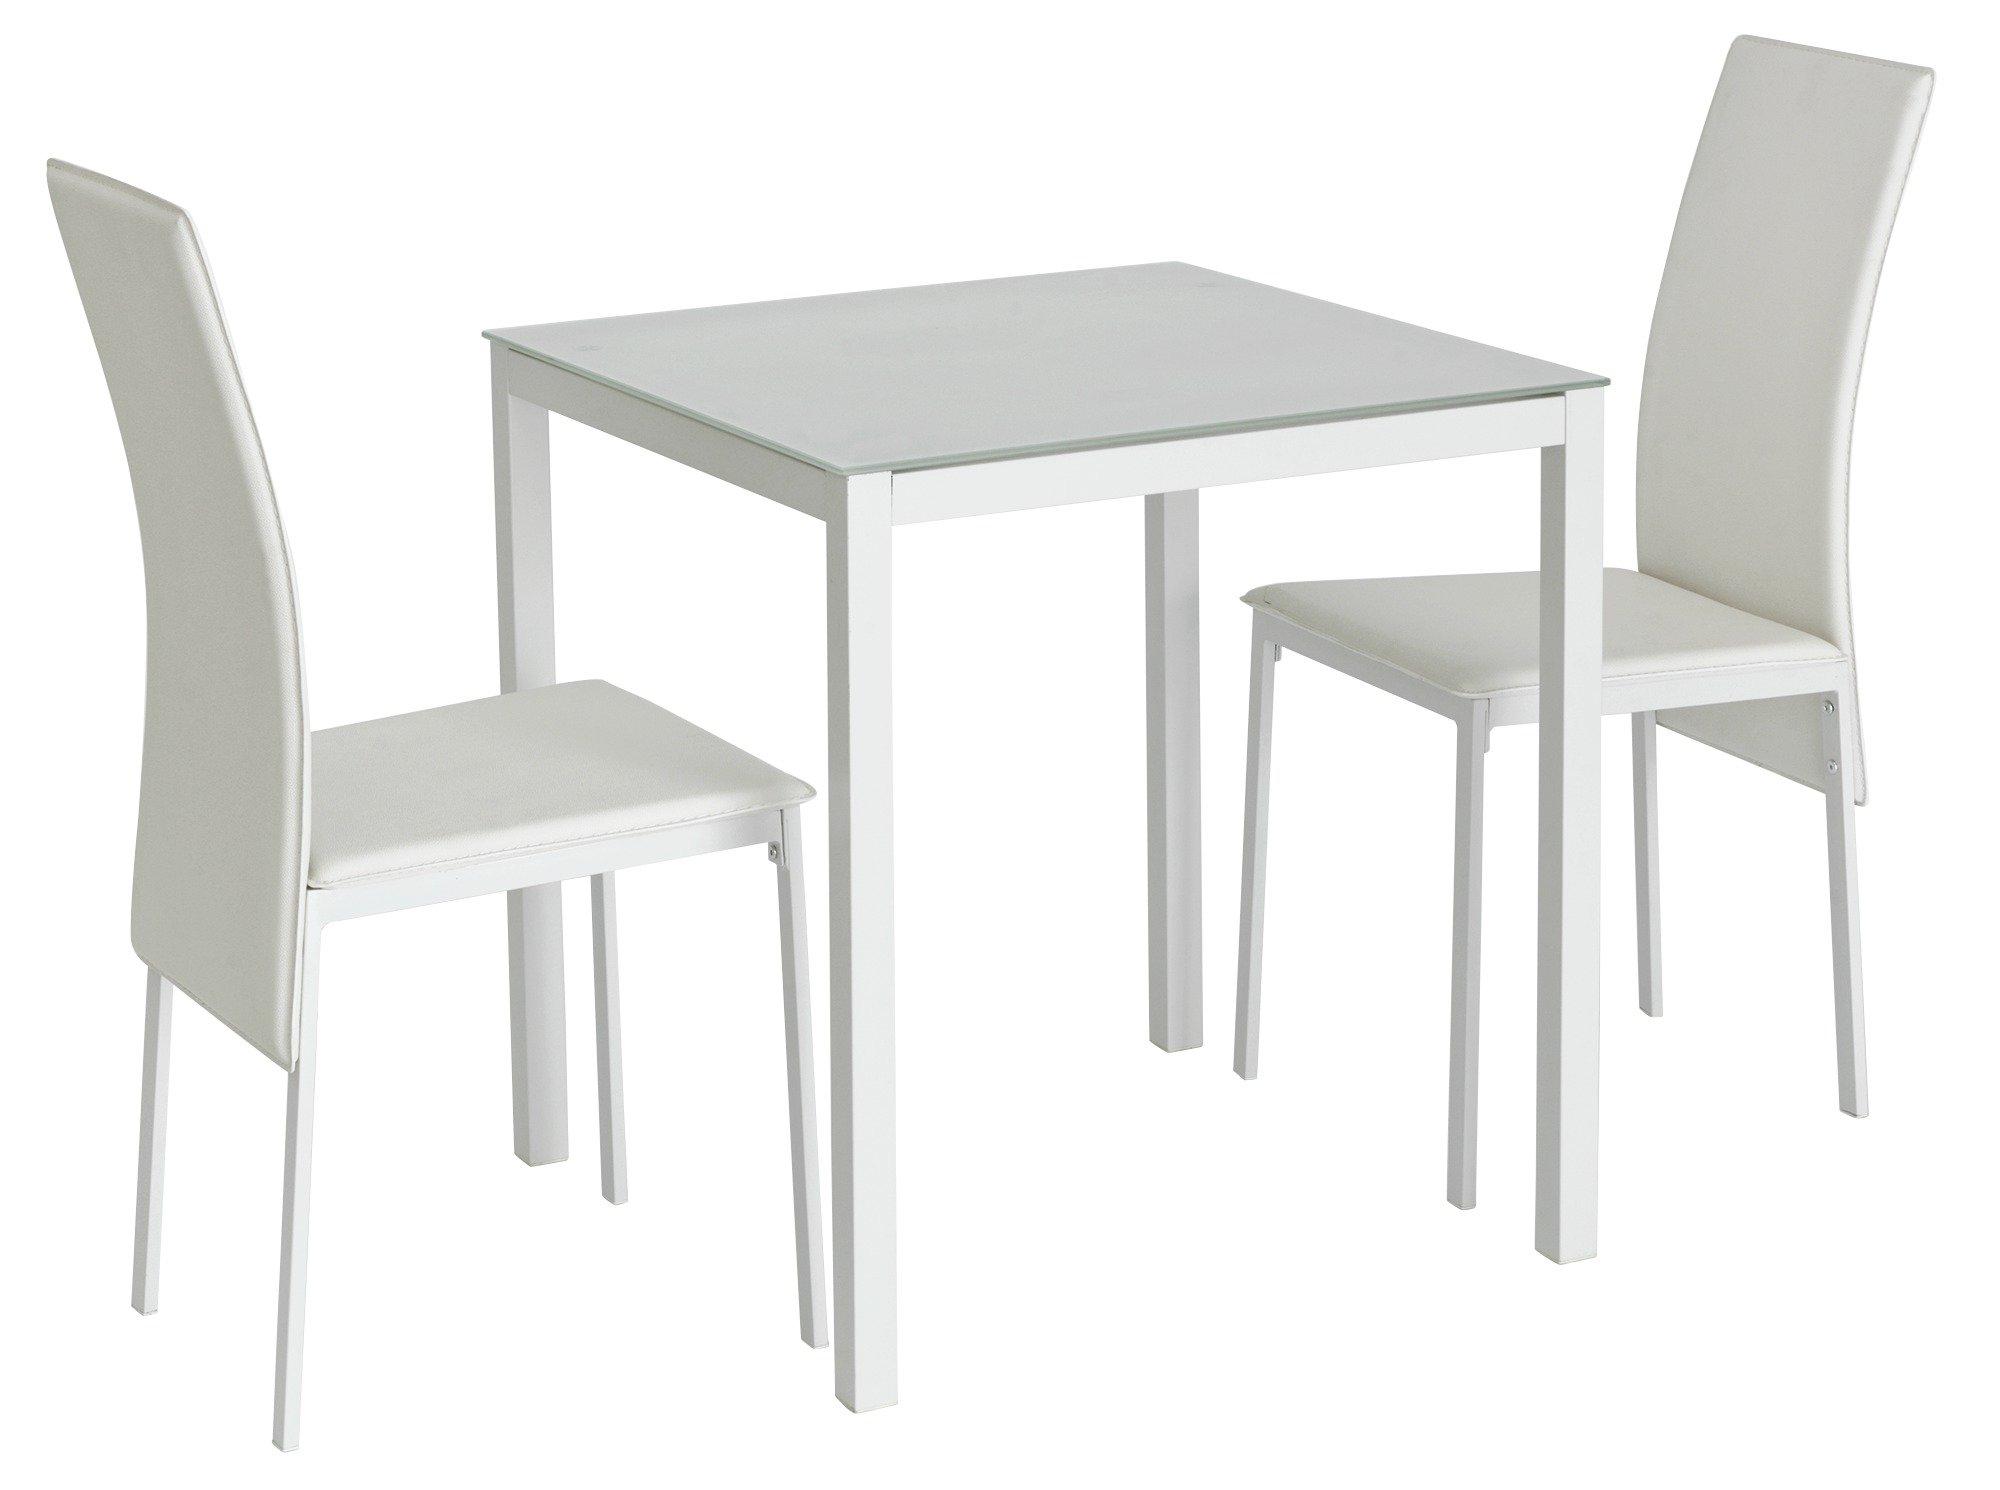 dining table and 2 chairs hygena lido glass dining table  : 7248645RZ001AWebu0026DefaultPDP570u0026WebPDPBadge570u0026toprightwowgreatpriceu0026bottomleftempty from videobyemail.info size 2000 x 1490 jpeg 116kB